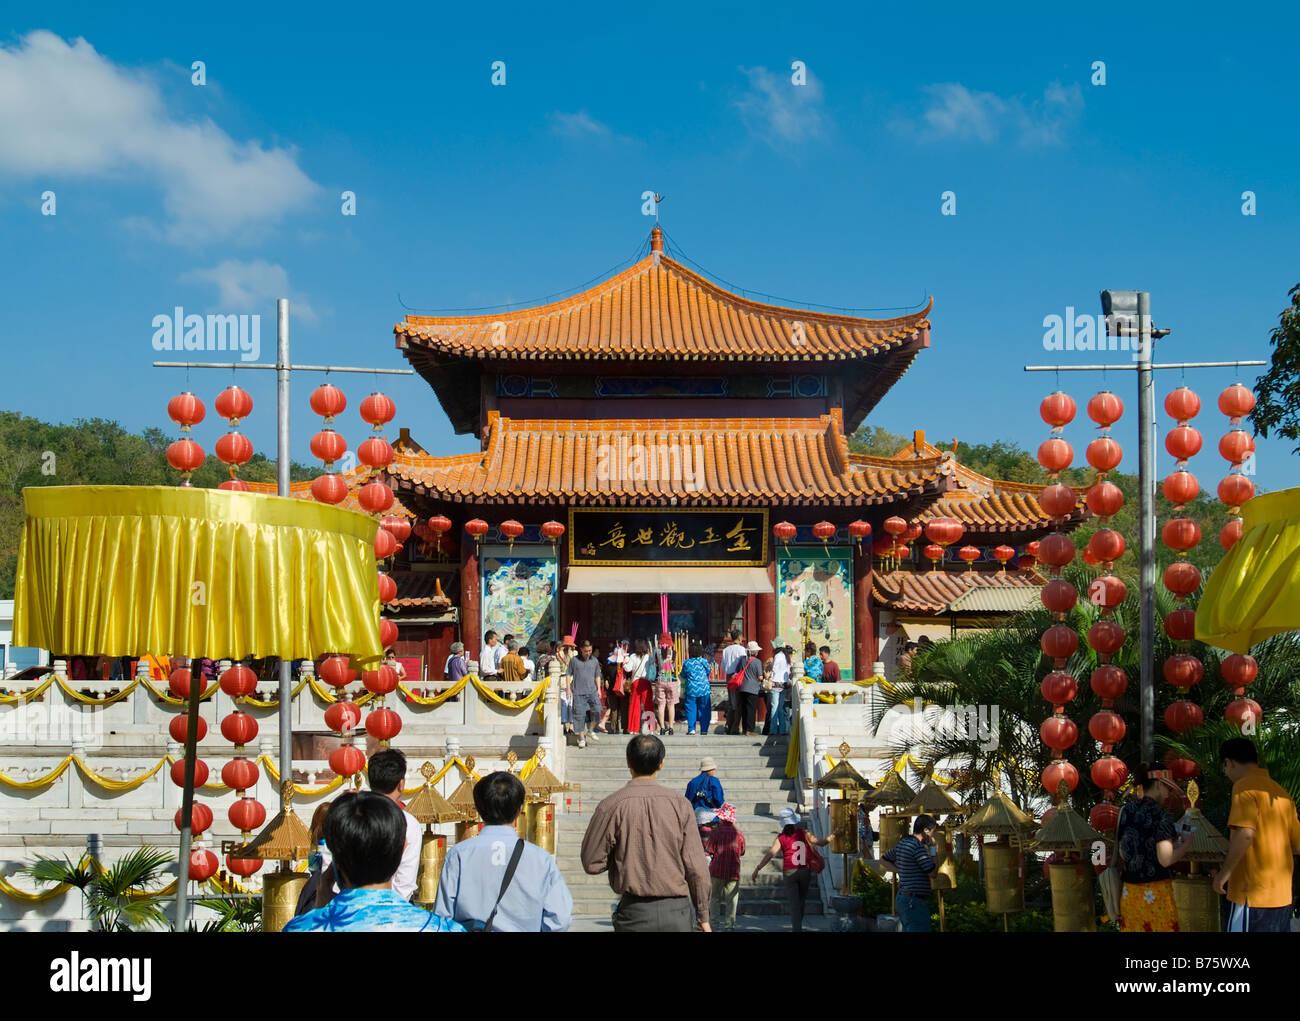 Buddhist Temple at Nanshan Buddhism Culture Park, Sanya, Hainan, China Stock Photo